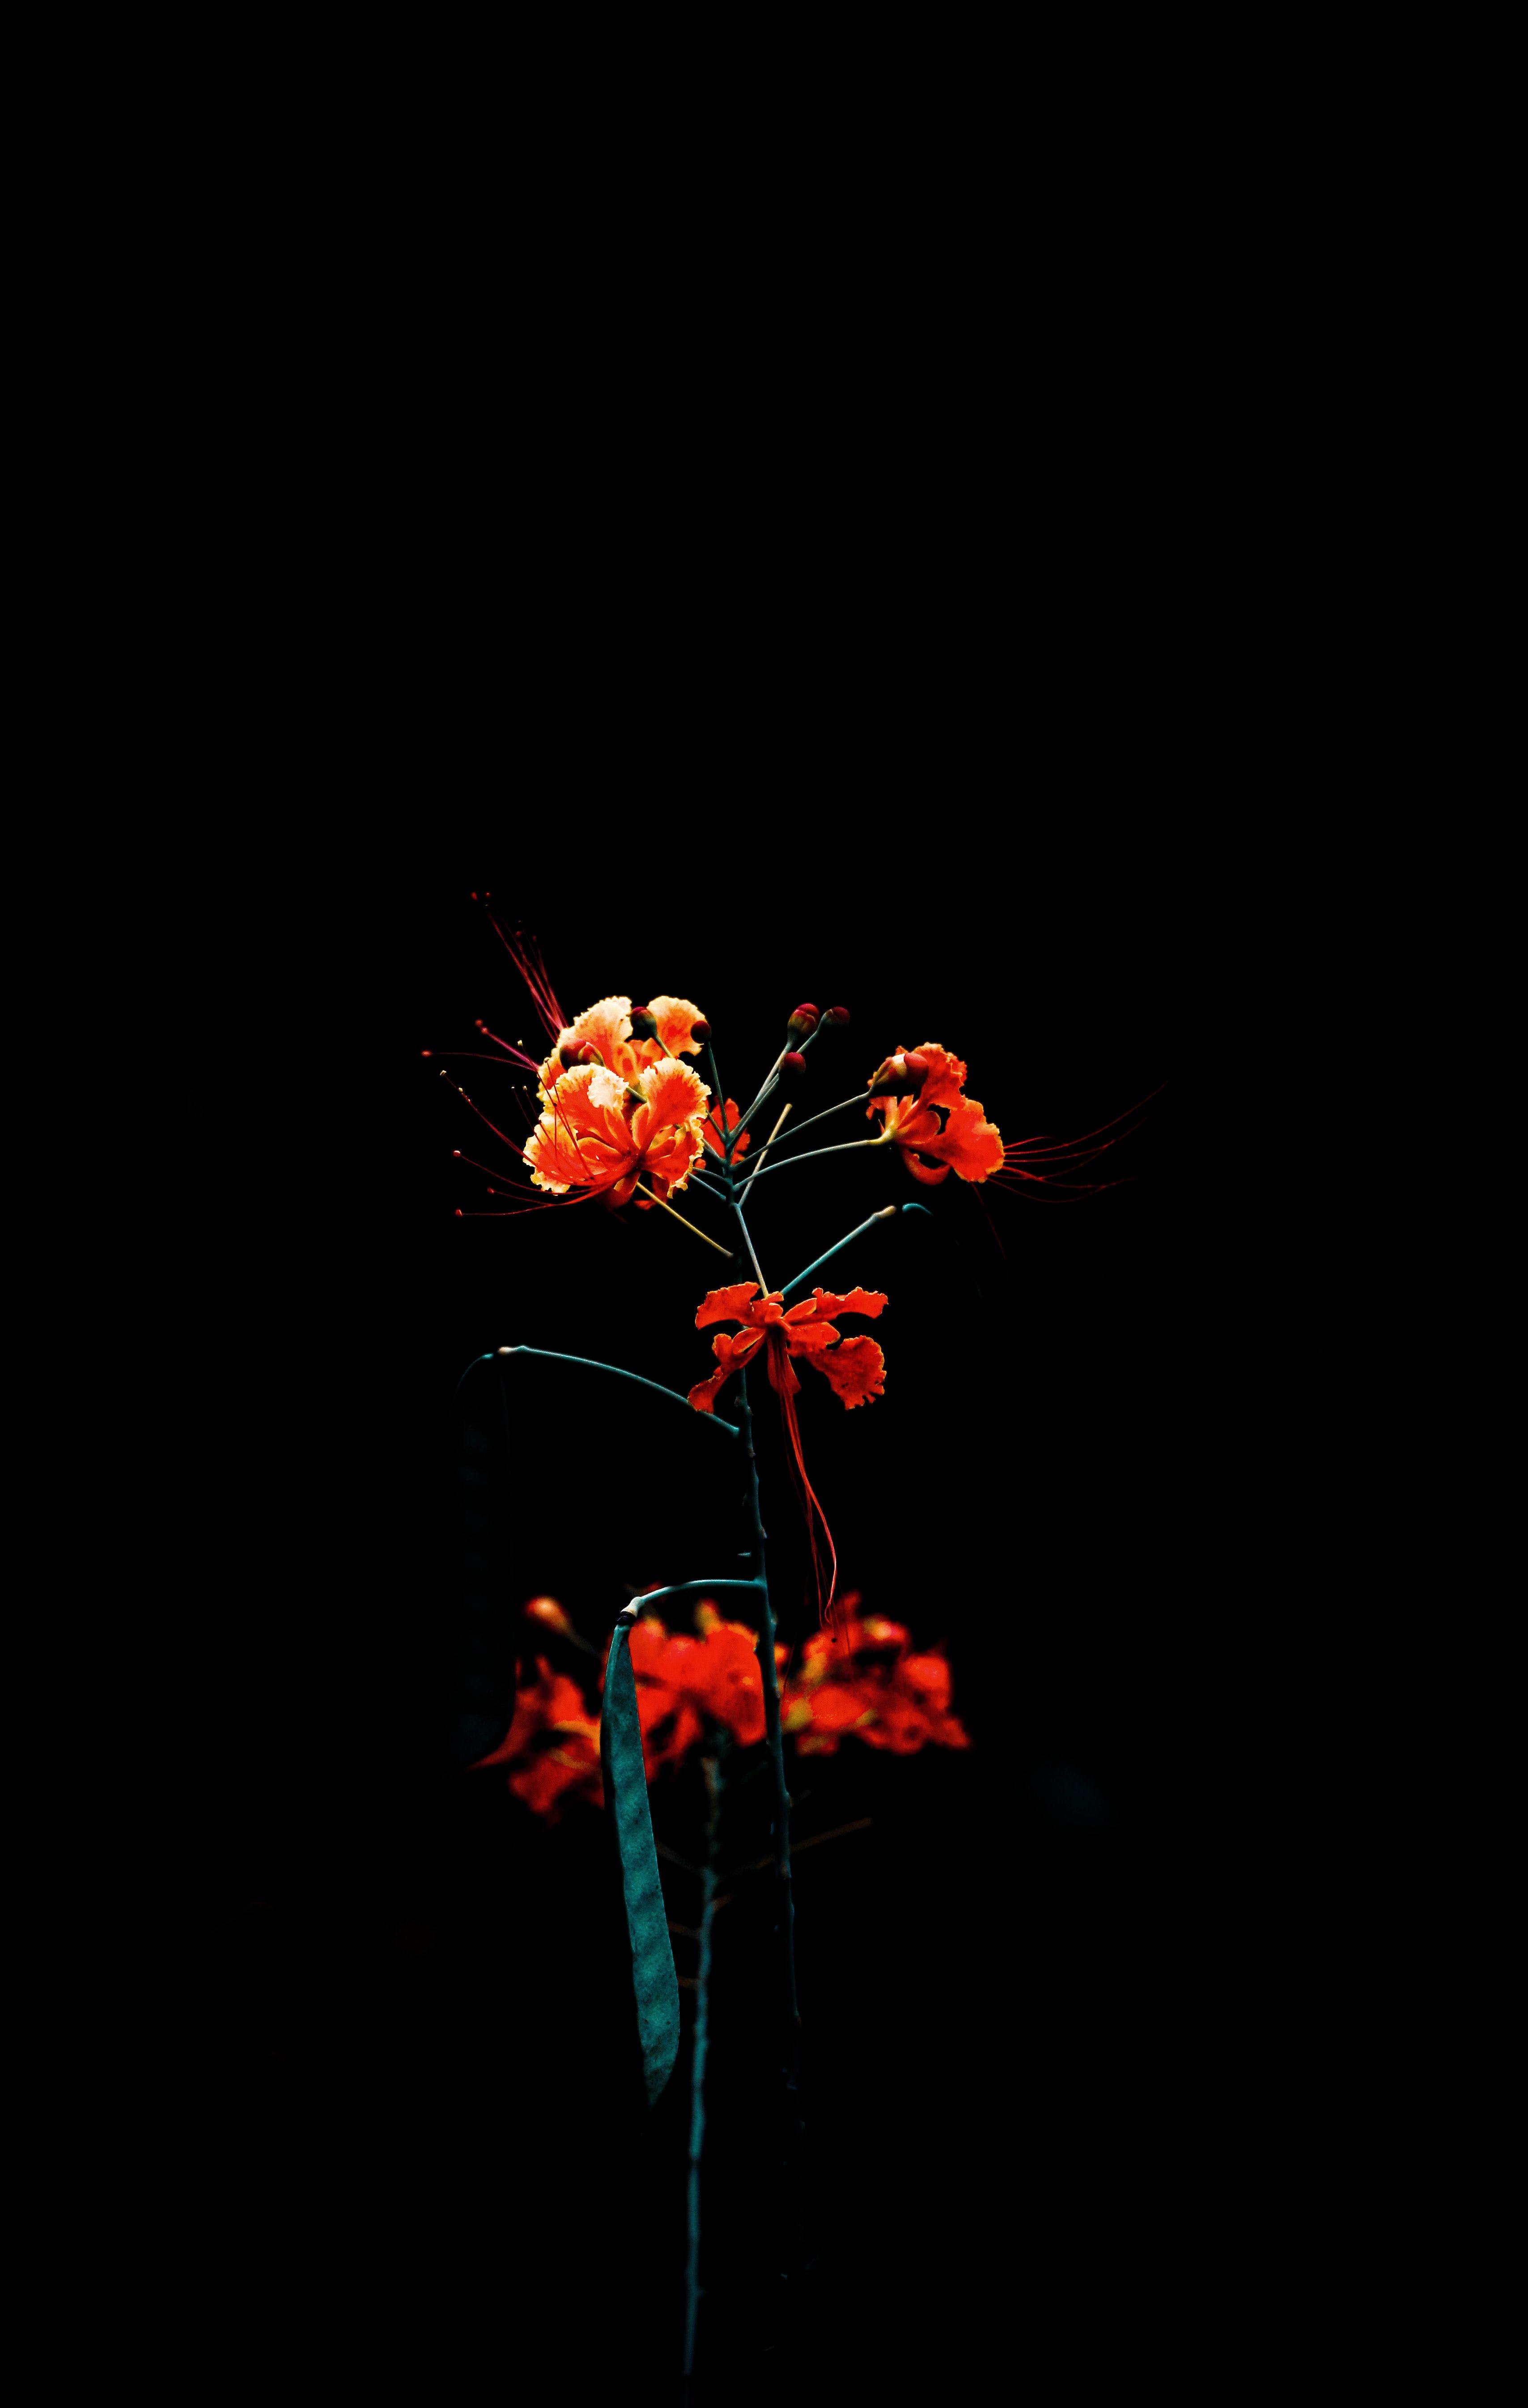 Free stock photo of beautiful, beautiful flowers, black, black background